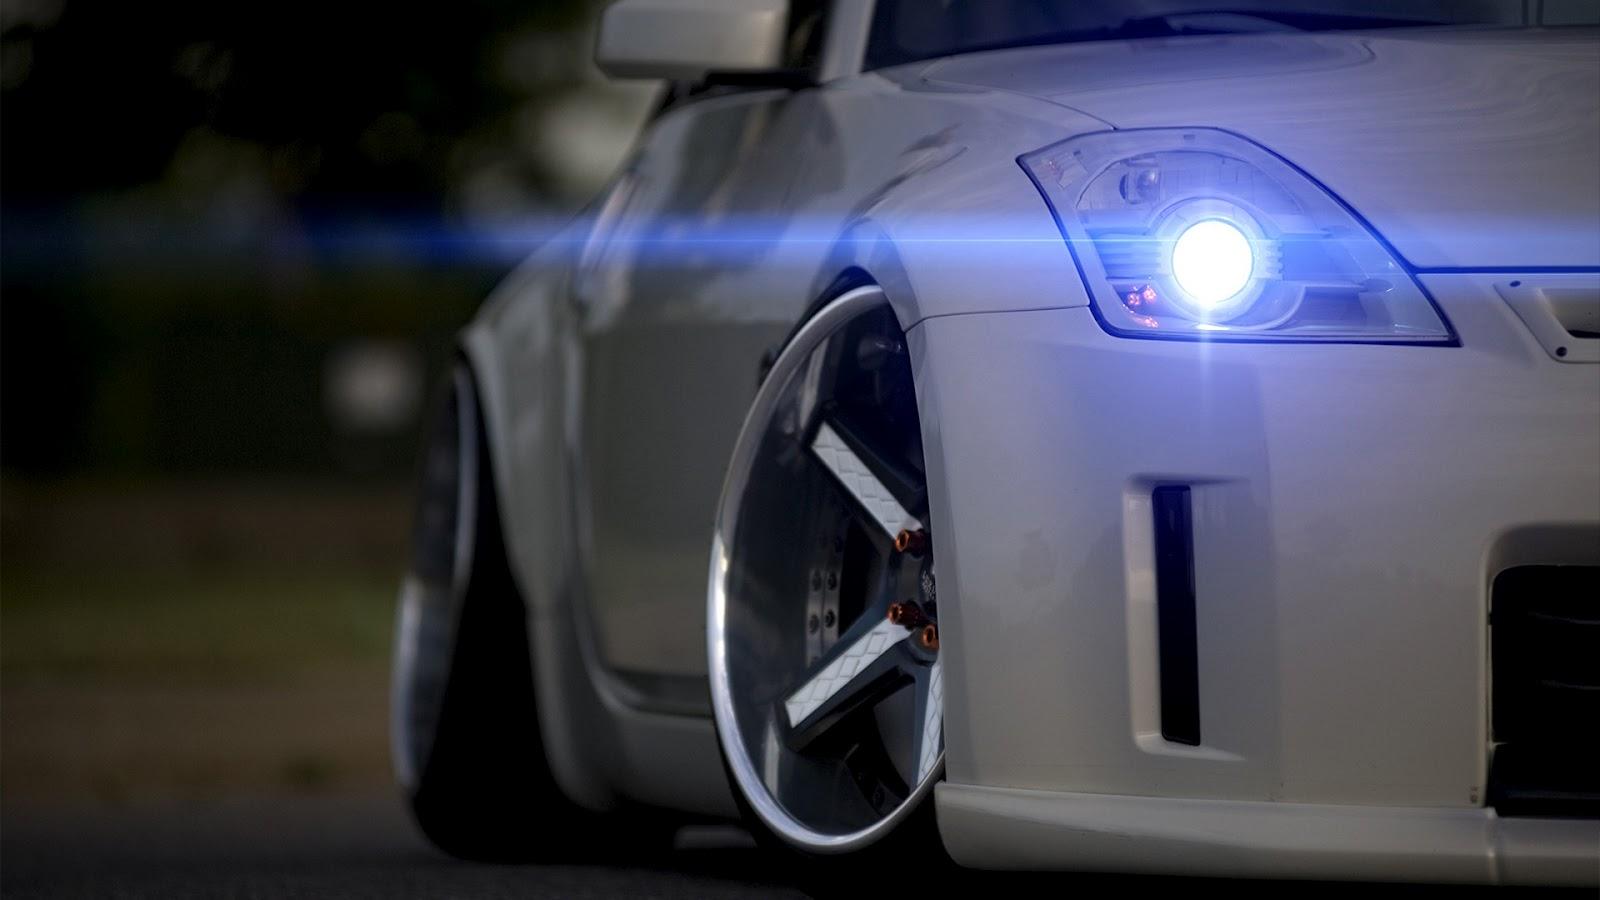 White Nissan 350 Z Front Headlight Hd Wallpaper Hd Car Wallpapers